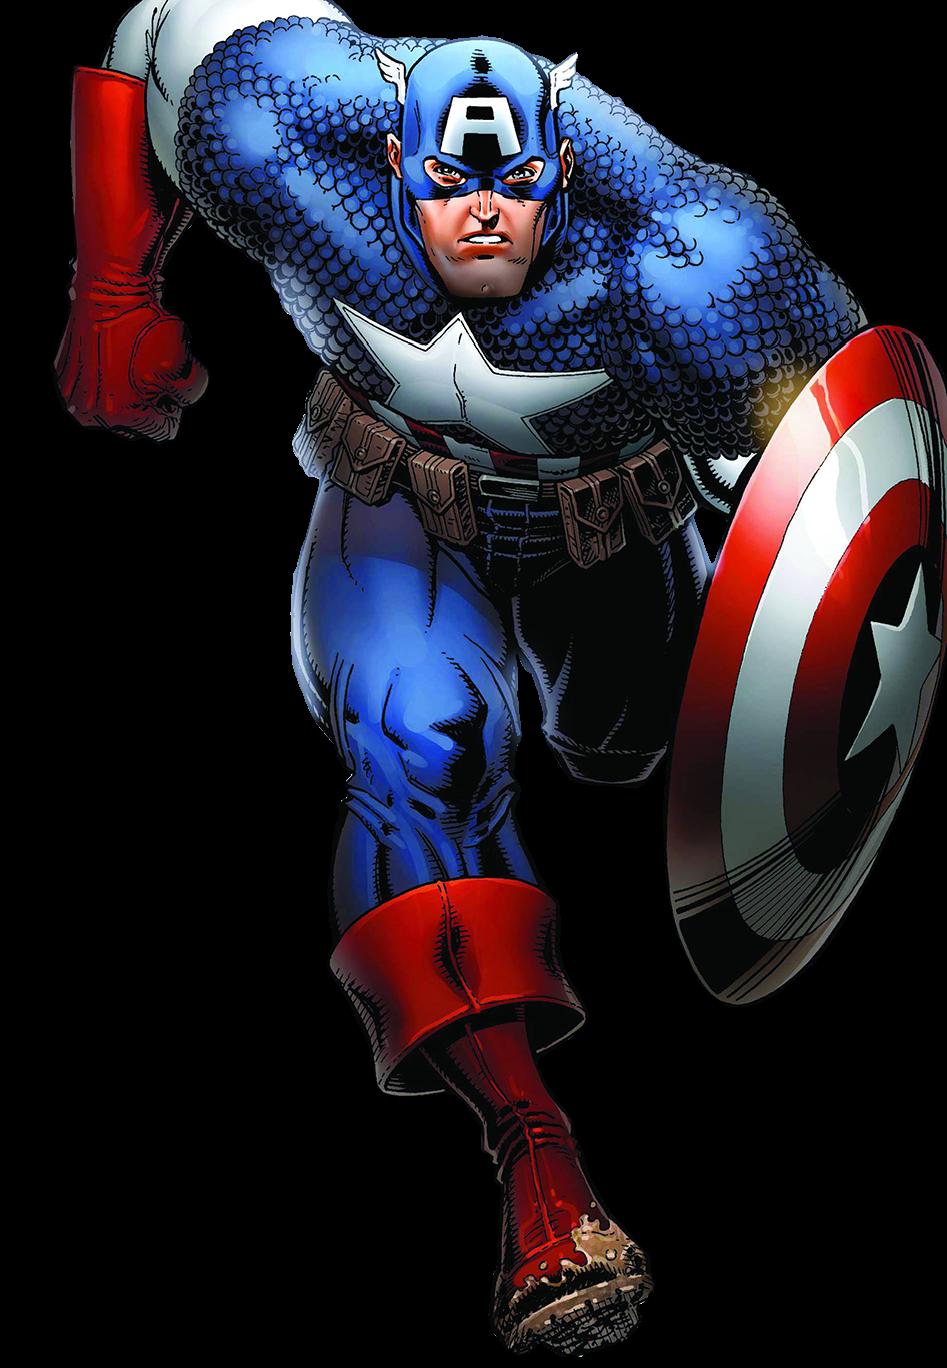 Marvel Captain America Png Image Captain America Captain America Comic Books Captain America Comic